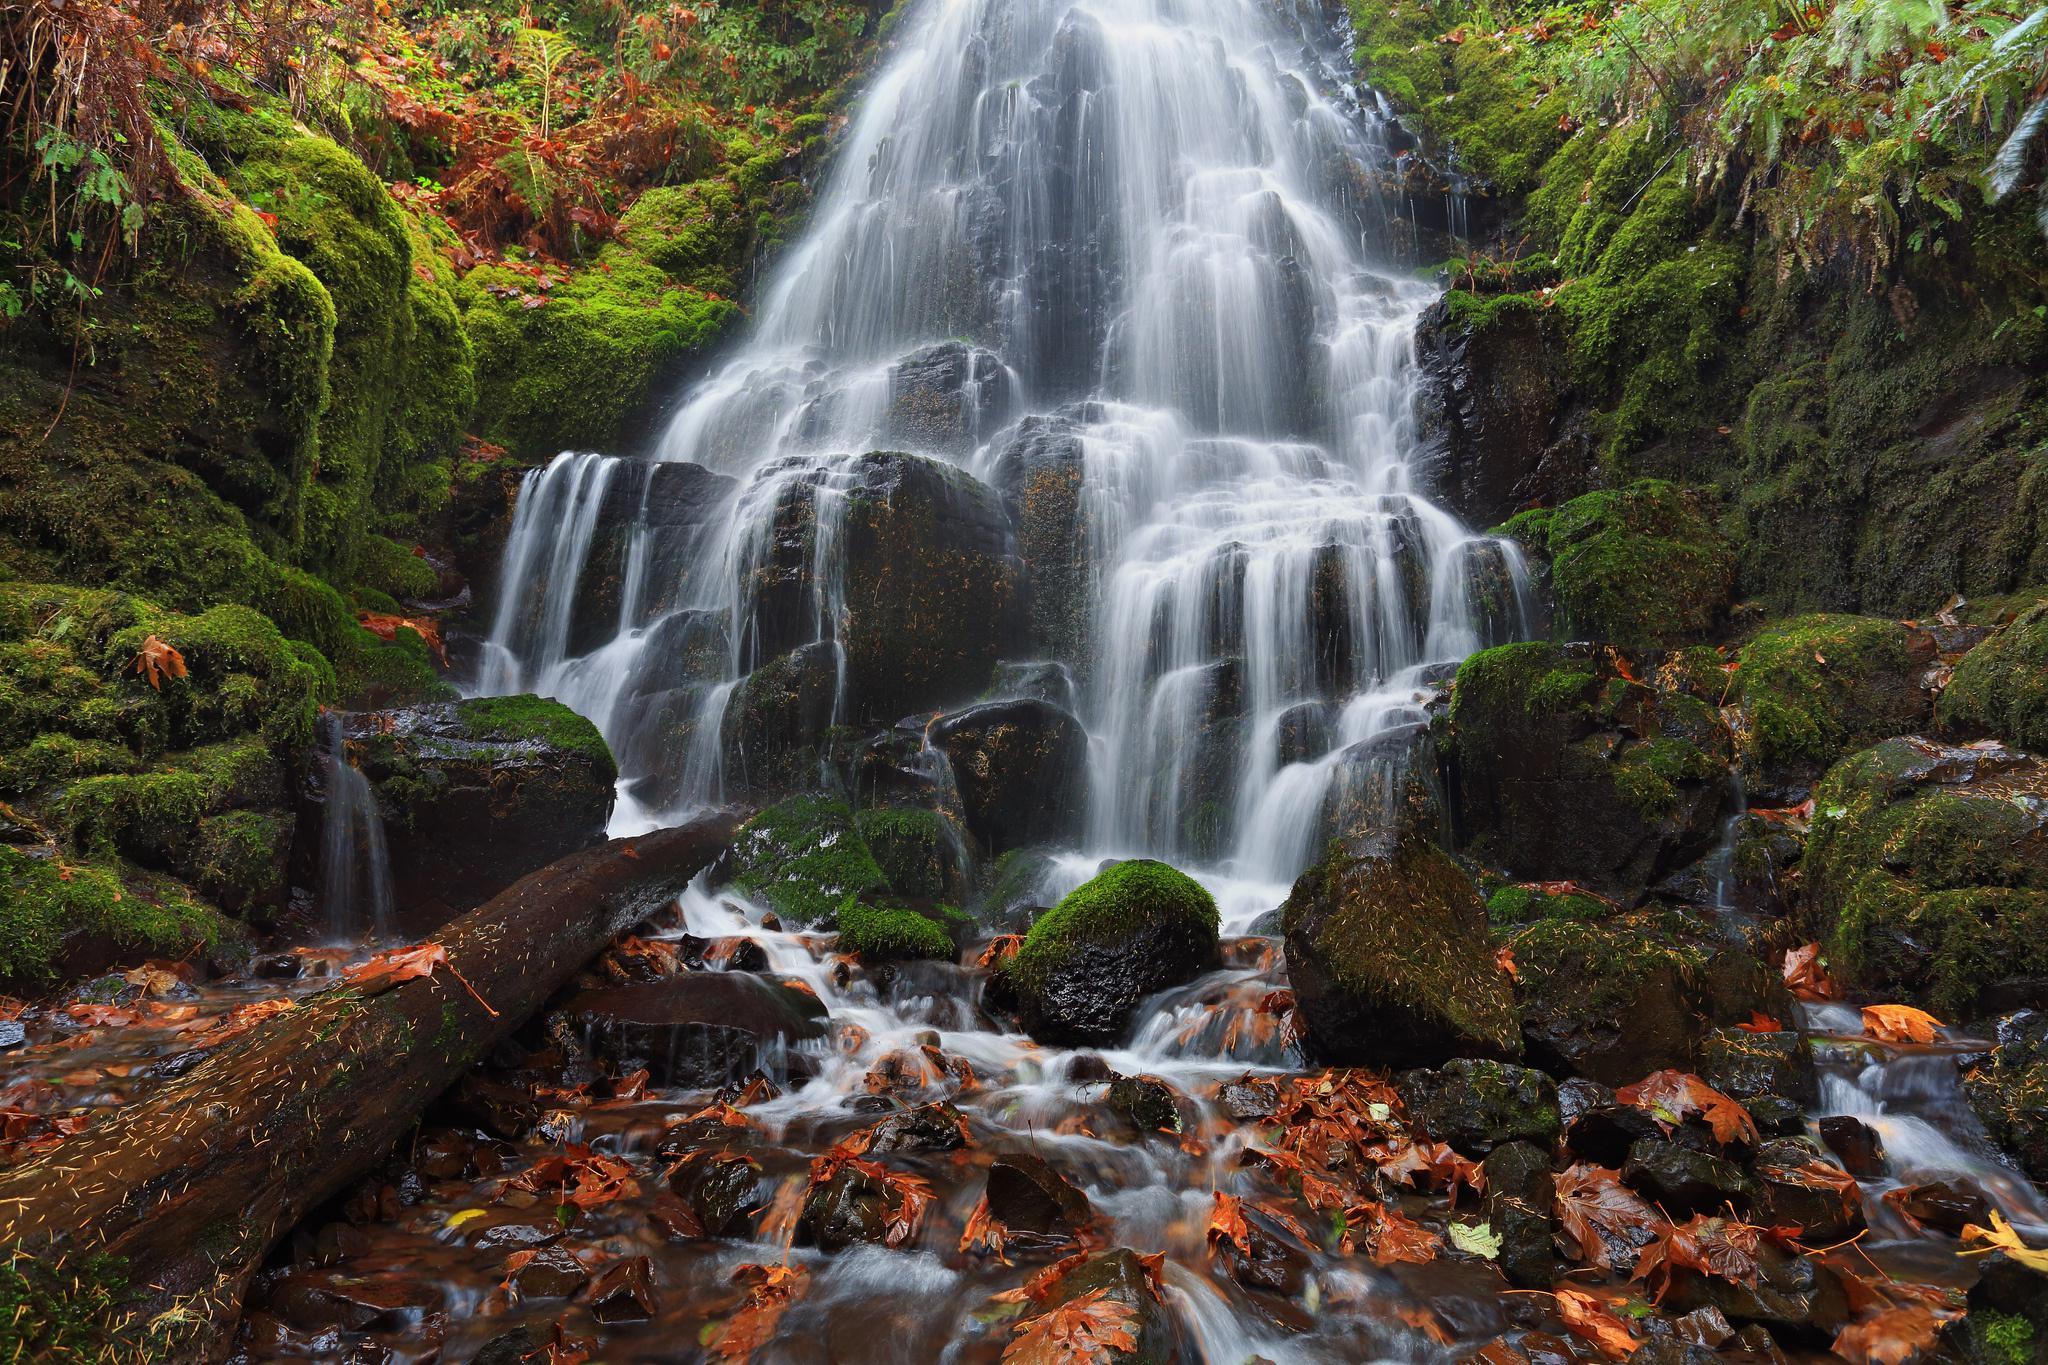 Portland Or Fall Had Wallpaper Hd Columbia River Oregon Waterfall Cascade Rocks Moss